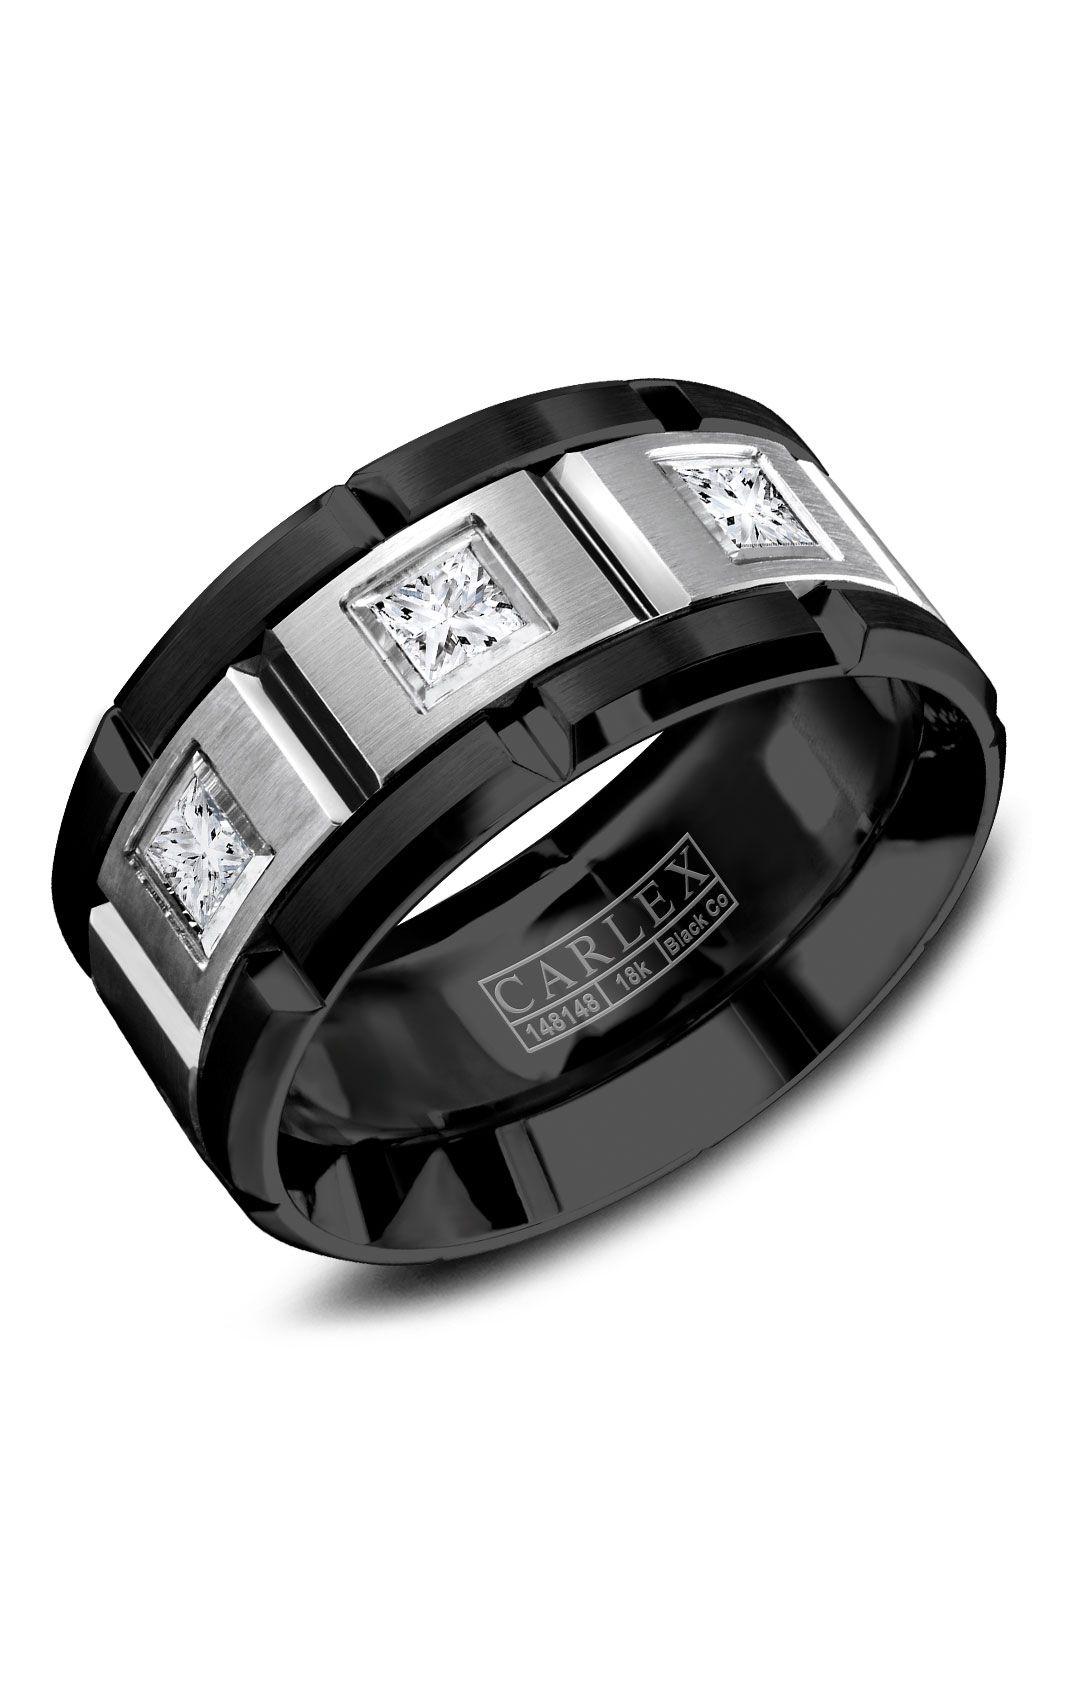 Carlex Sport WB-9474WB product image